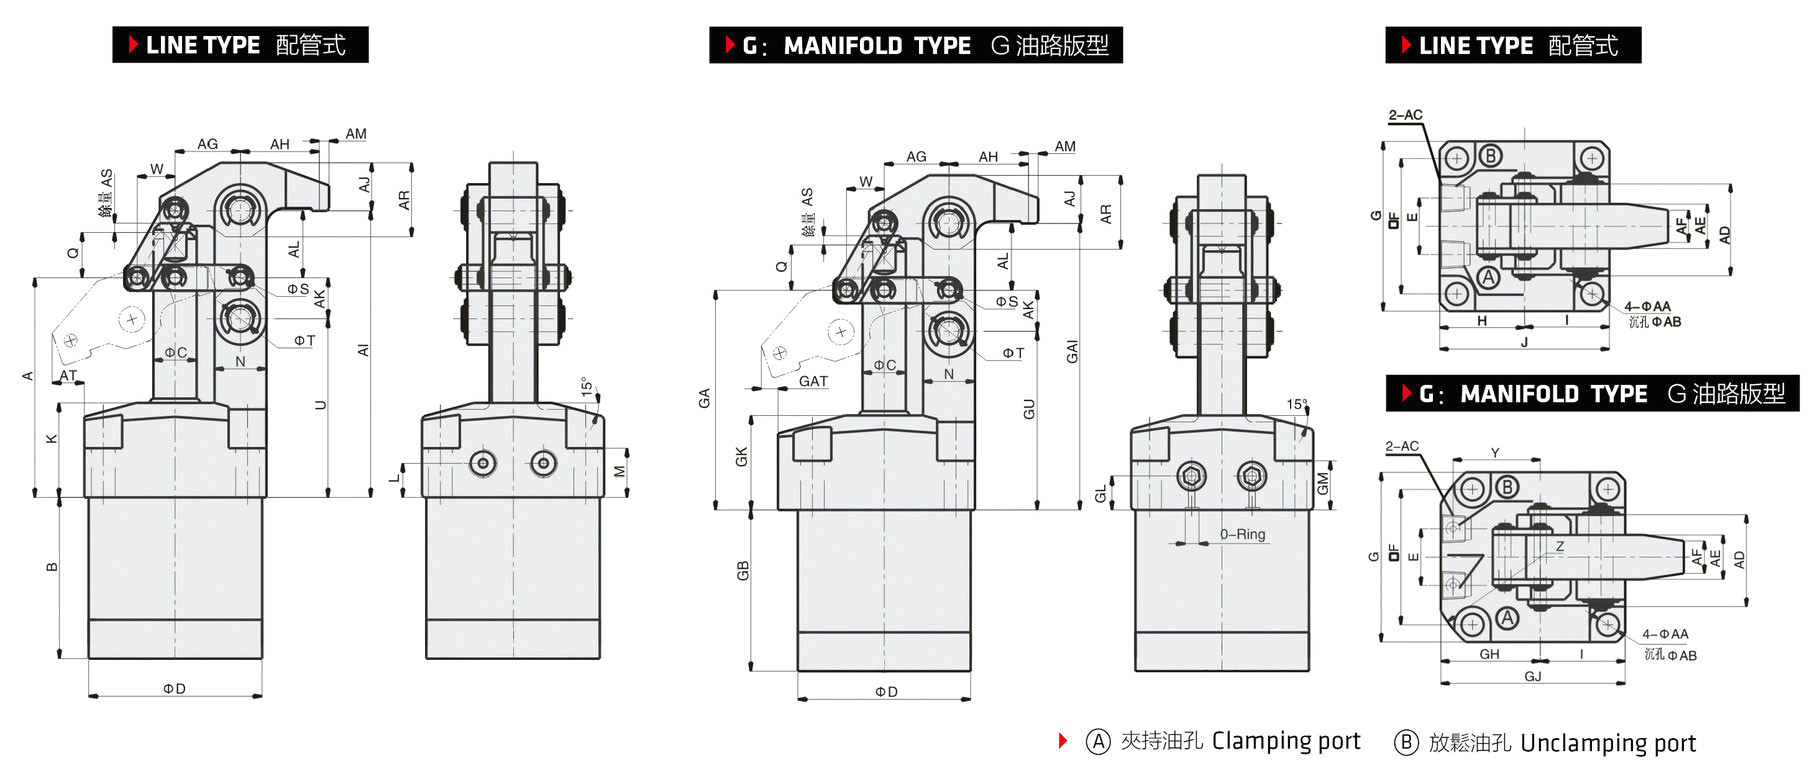 G Clamp Drawing Hydraulische Hebelspanner Clf5h Clka Lhc01 Clamptek Spanner